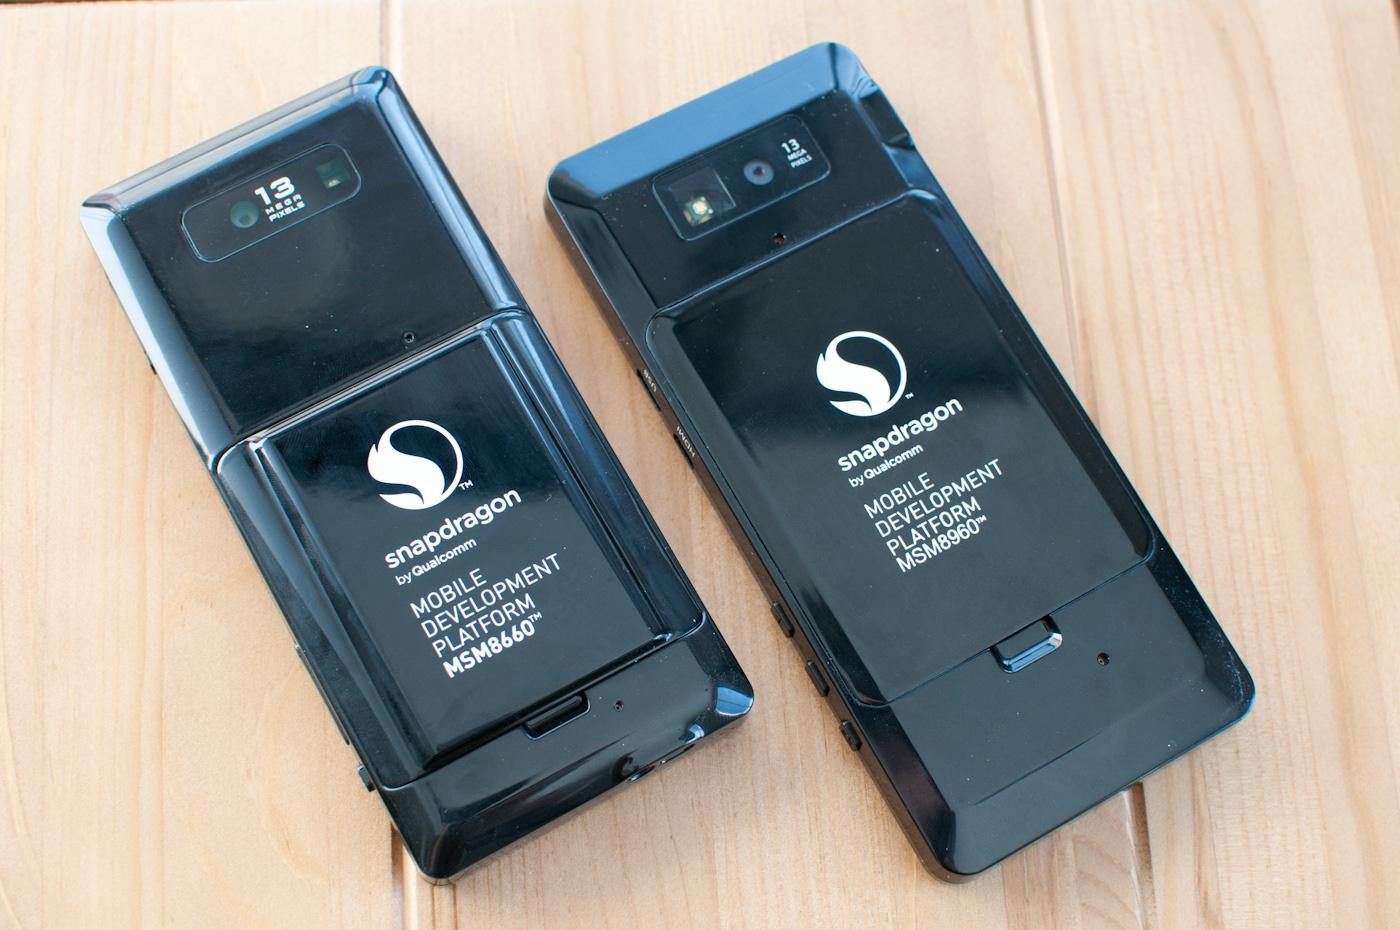 Microsoft testing dual-core snapdragon s4 for windows phone 8?